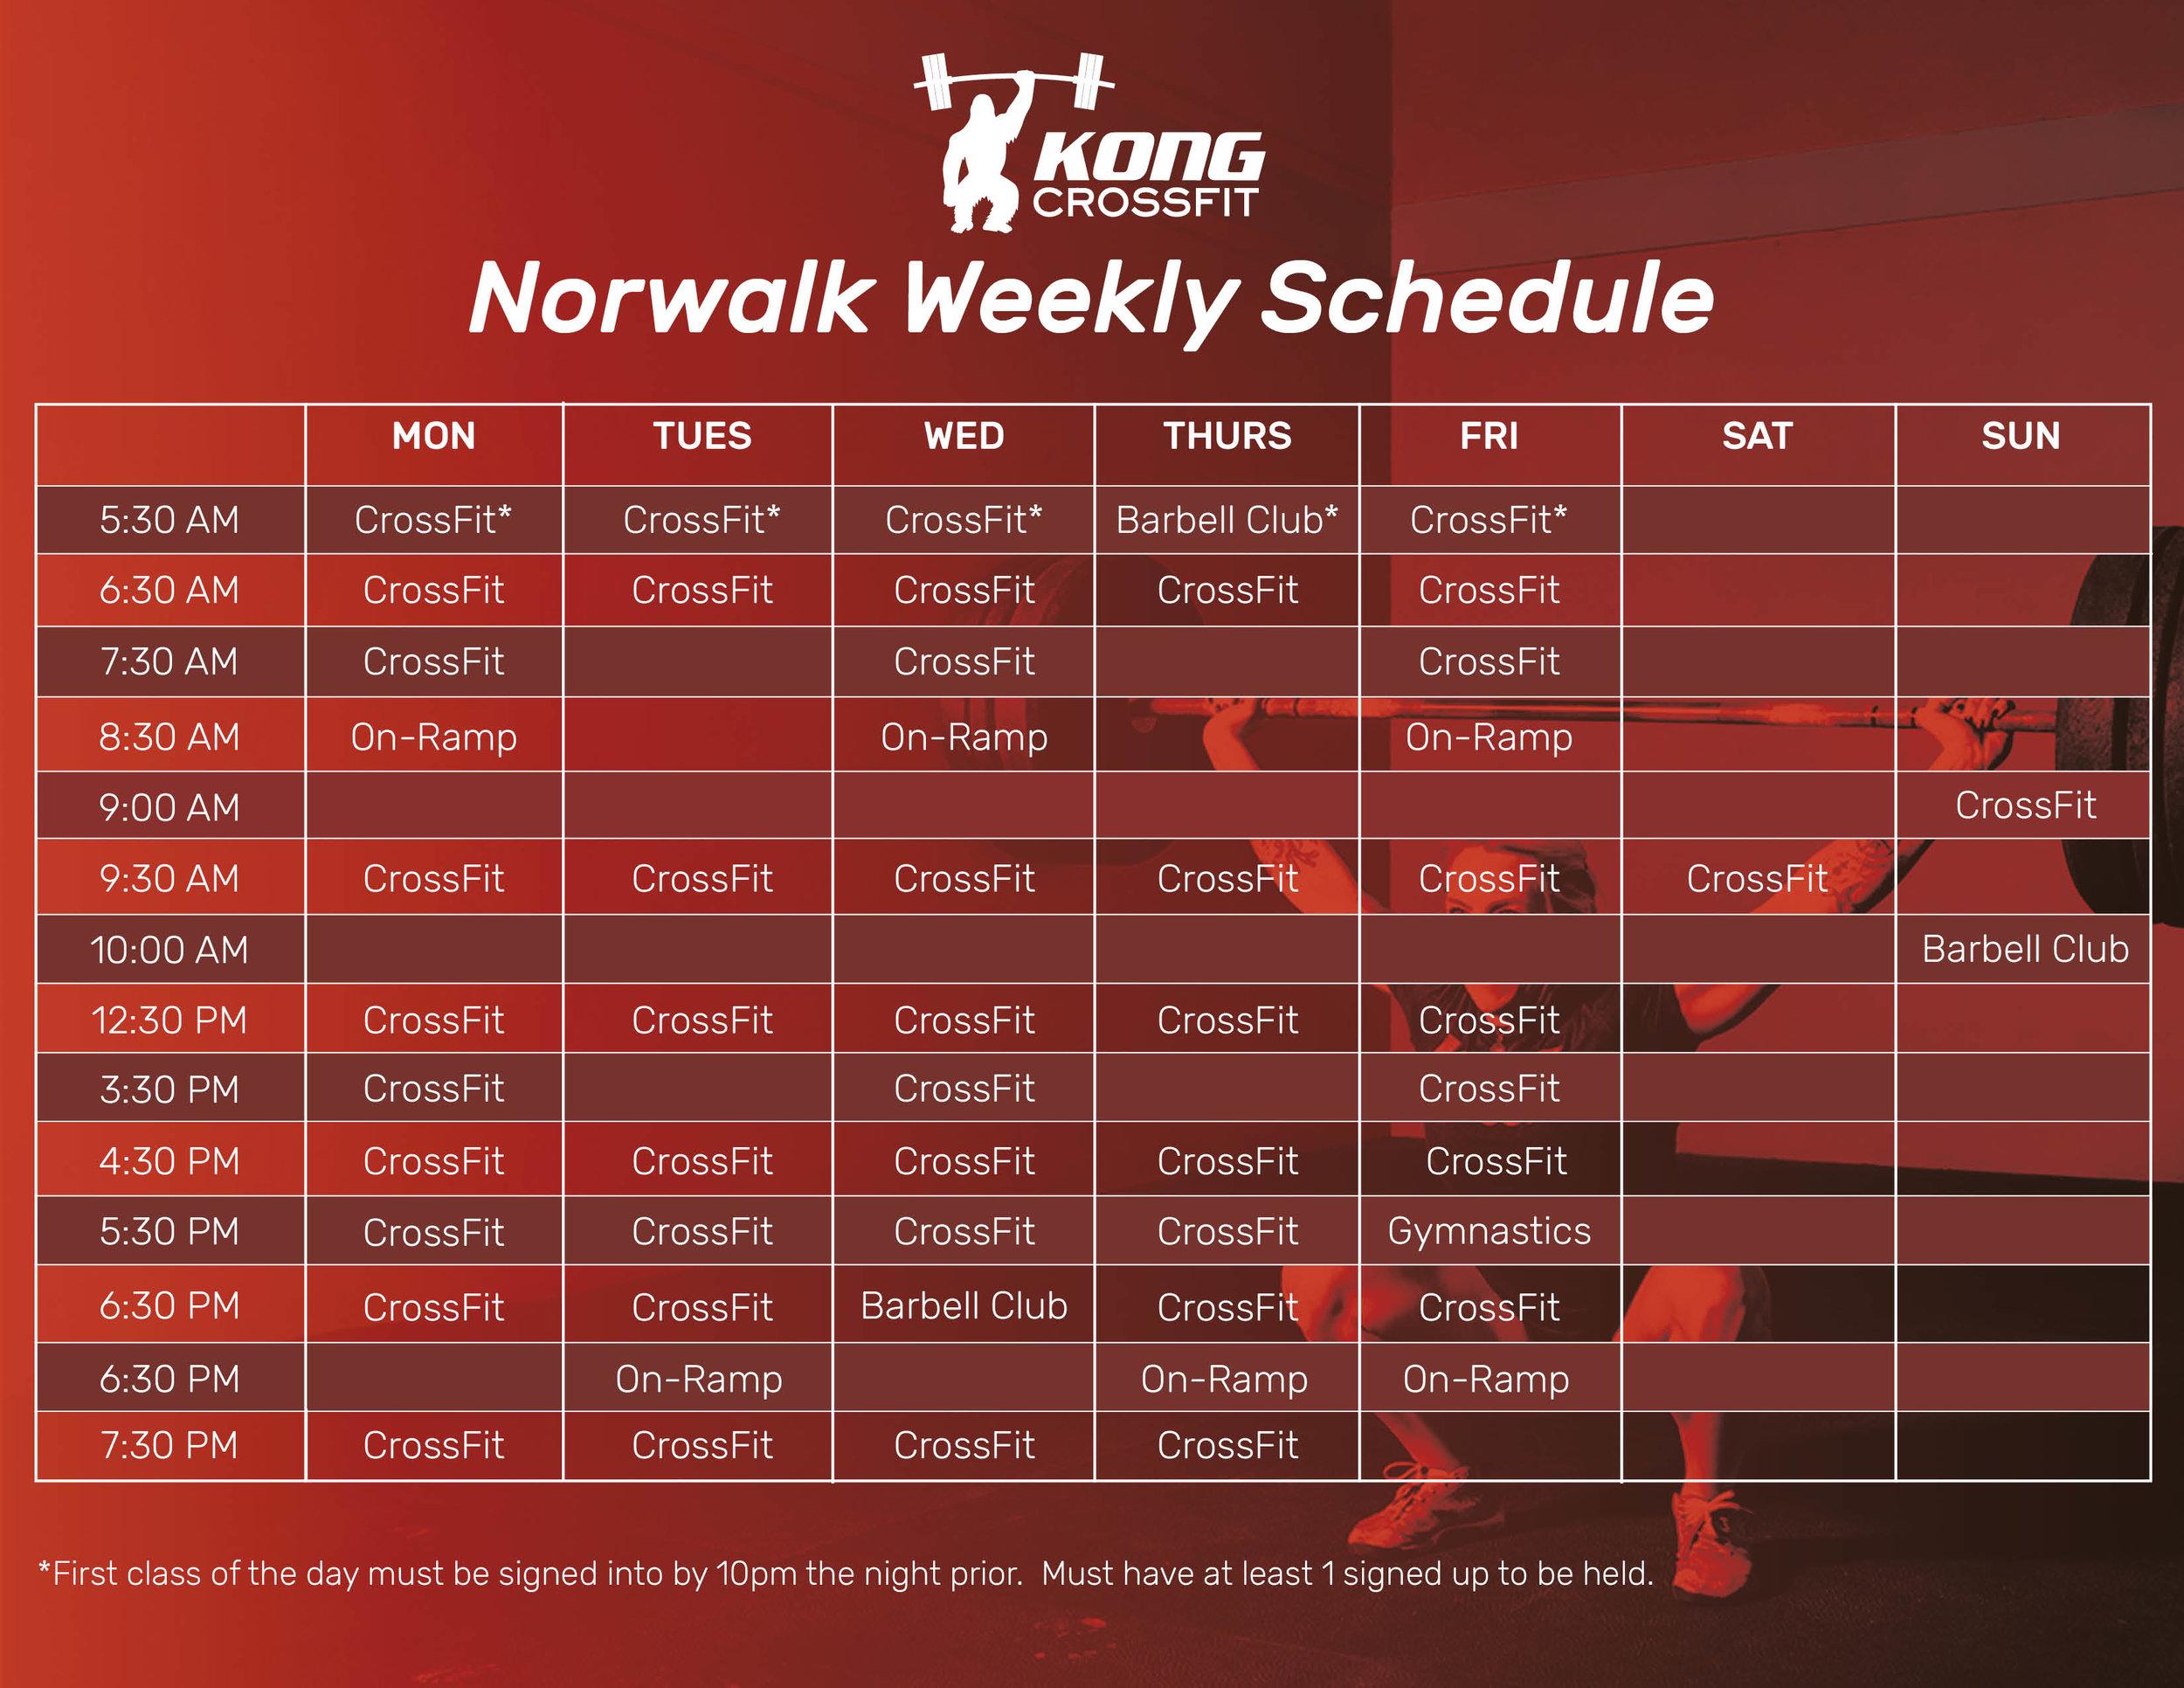 Schedule_Template_1-2-18_Norwalk.jpg